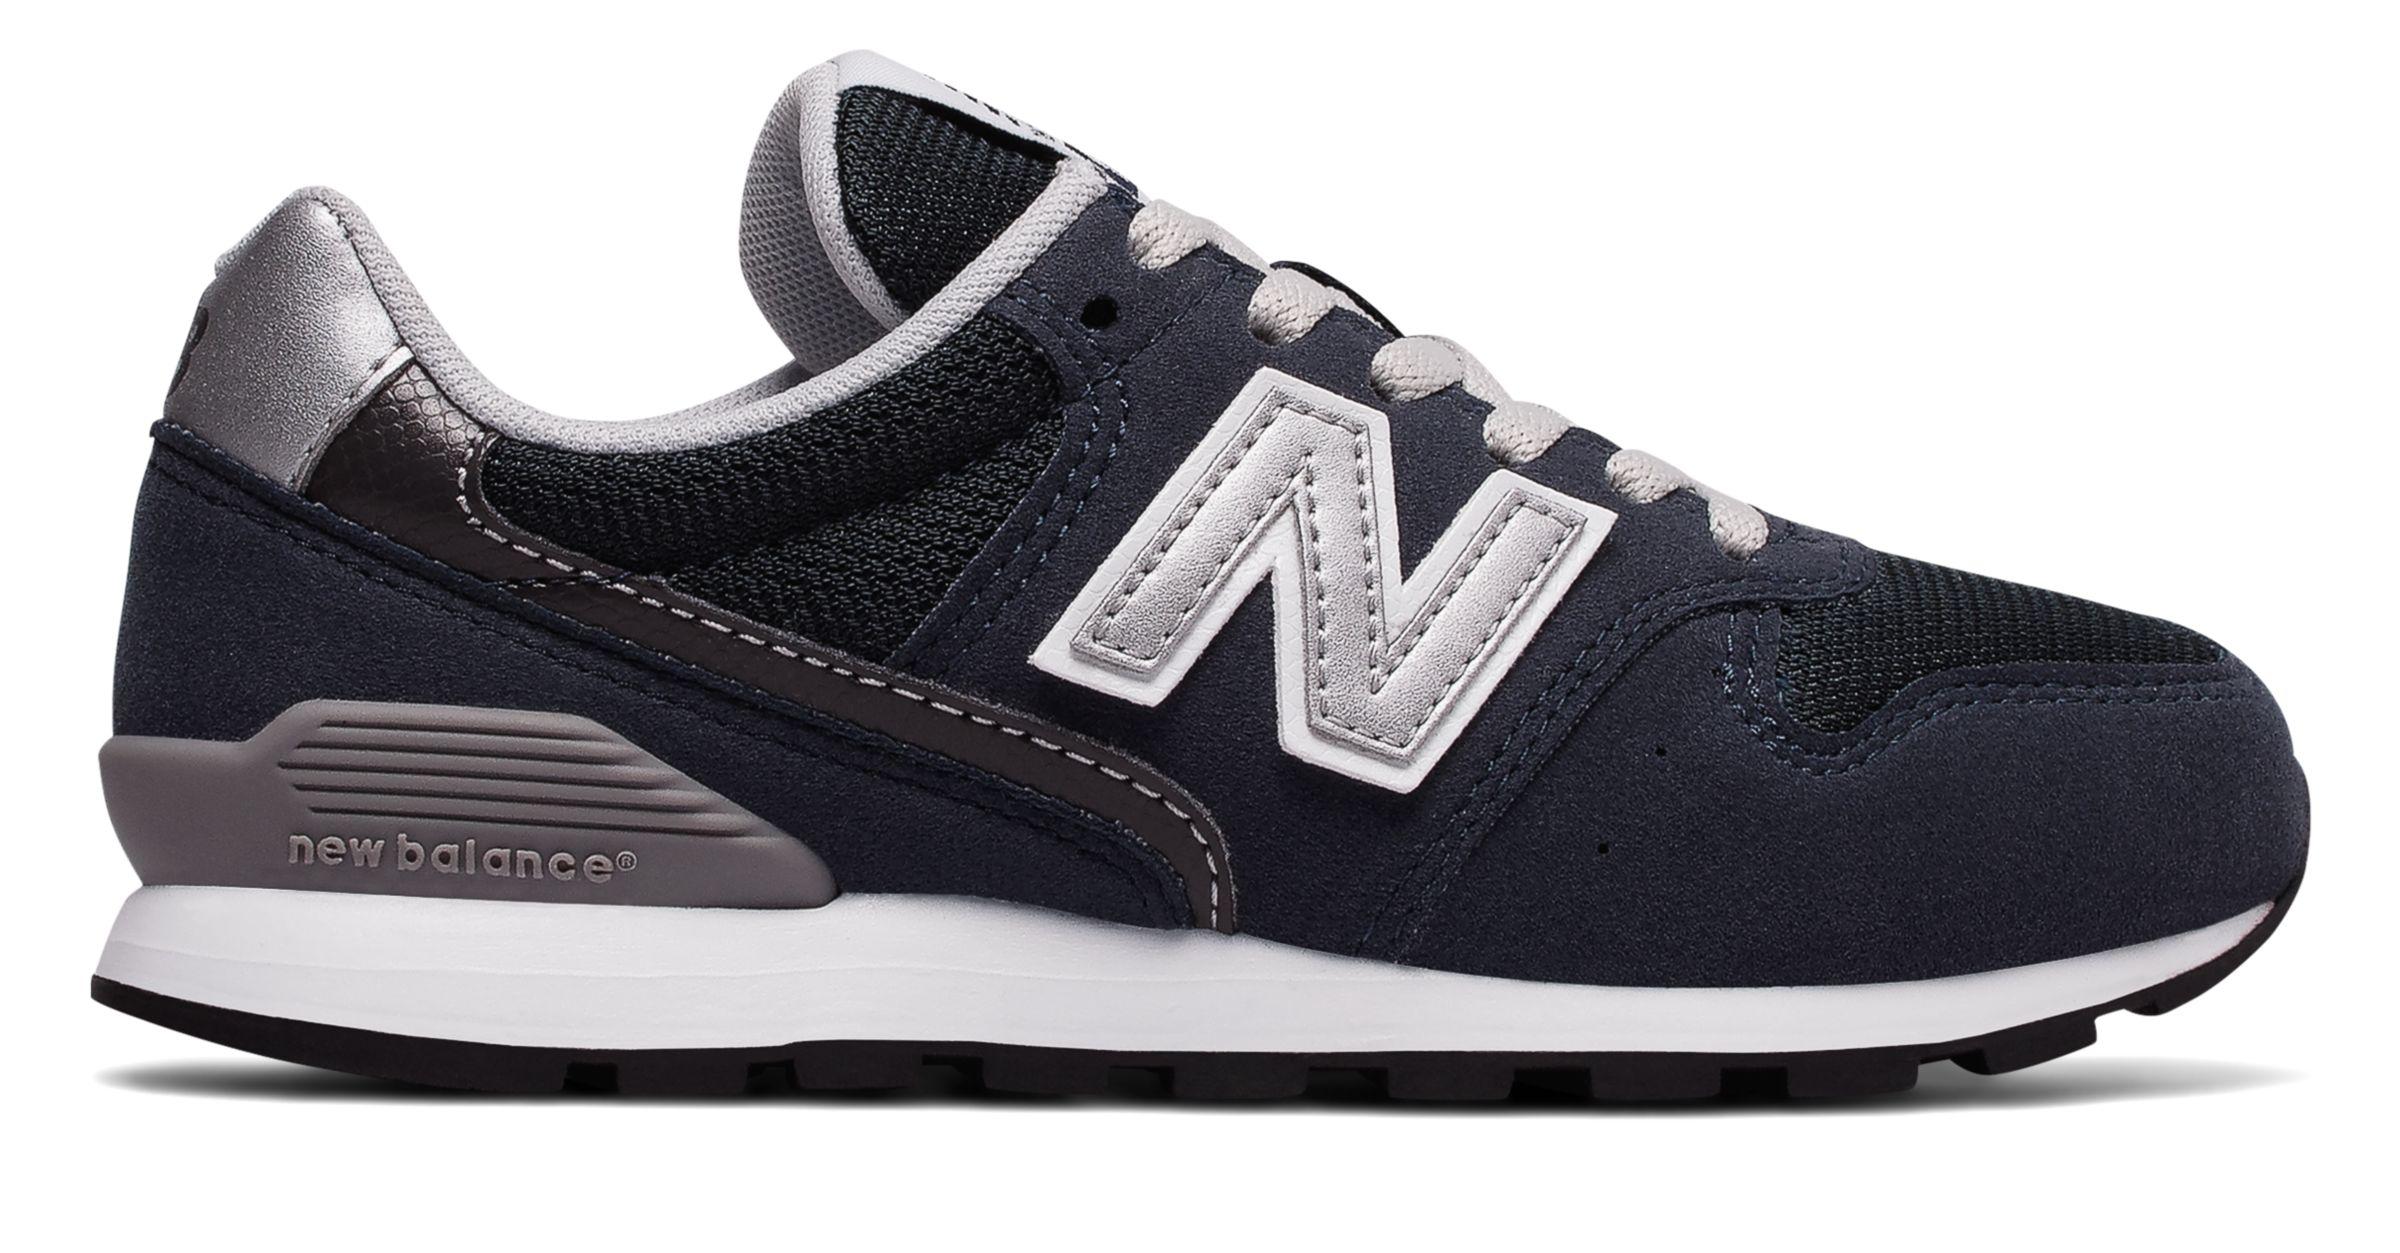 NB 996 New Balance, Ink Navy